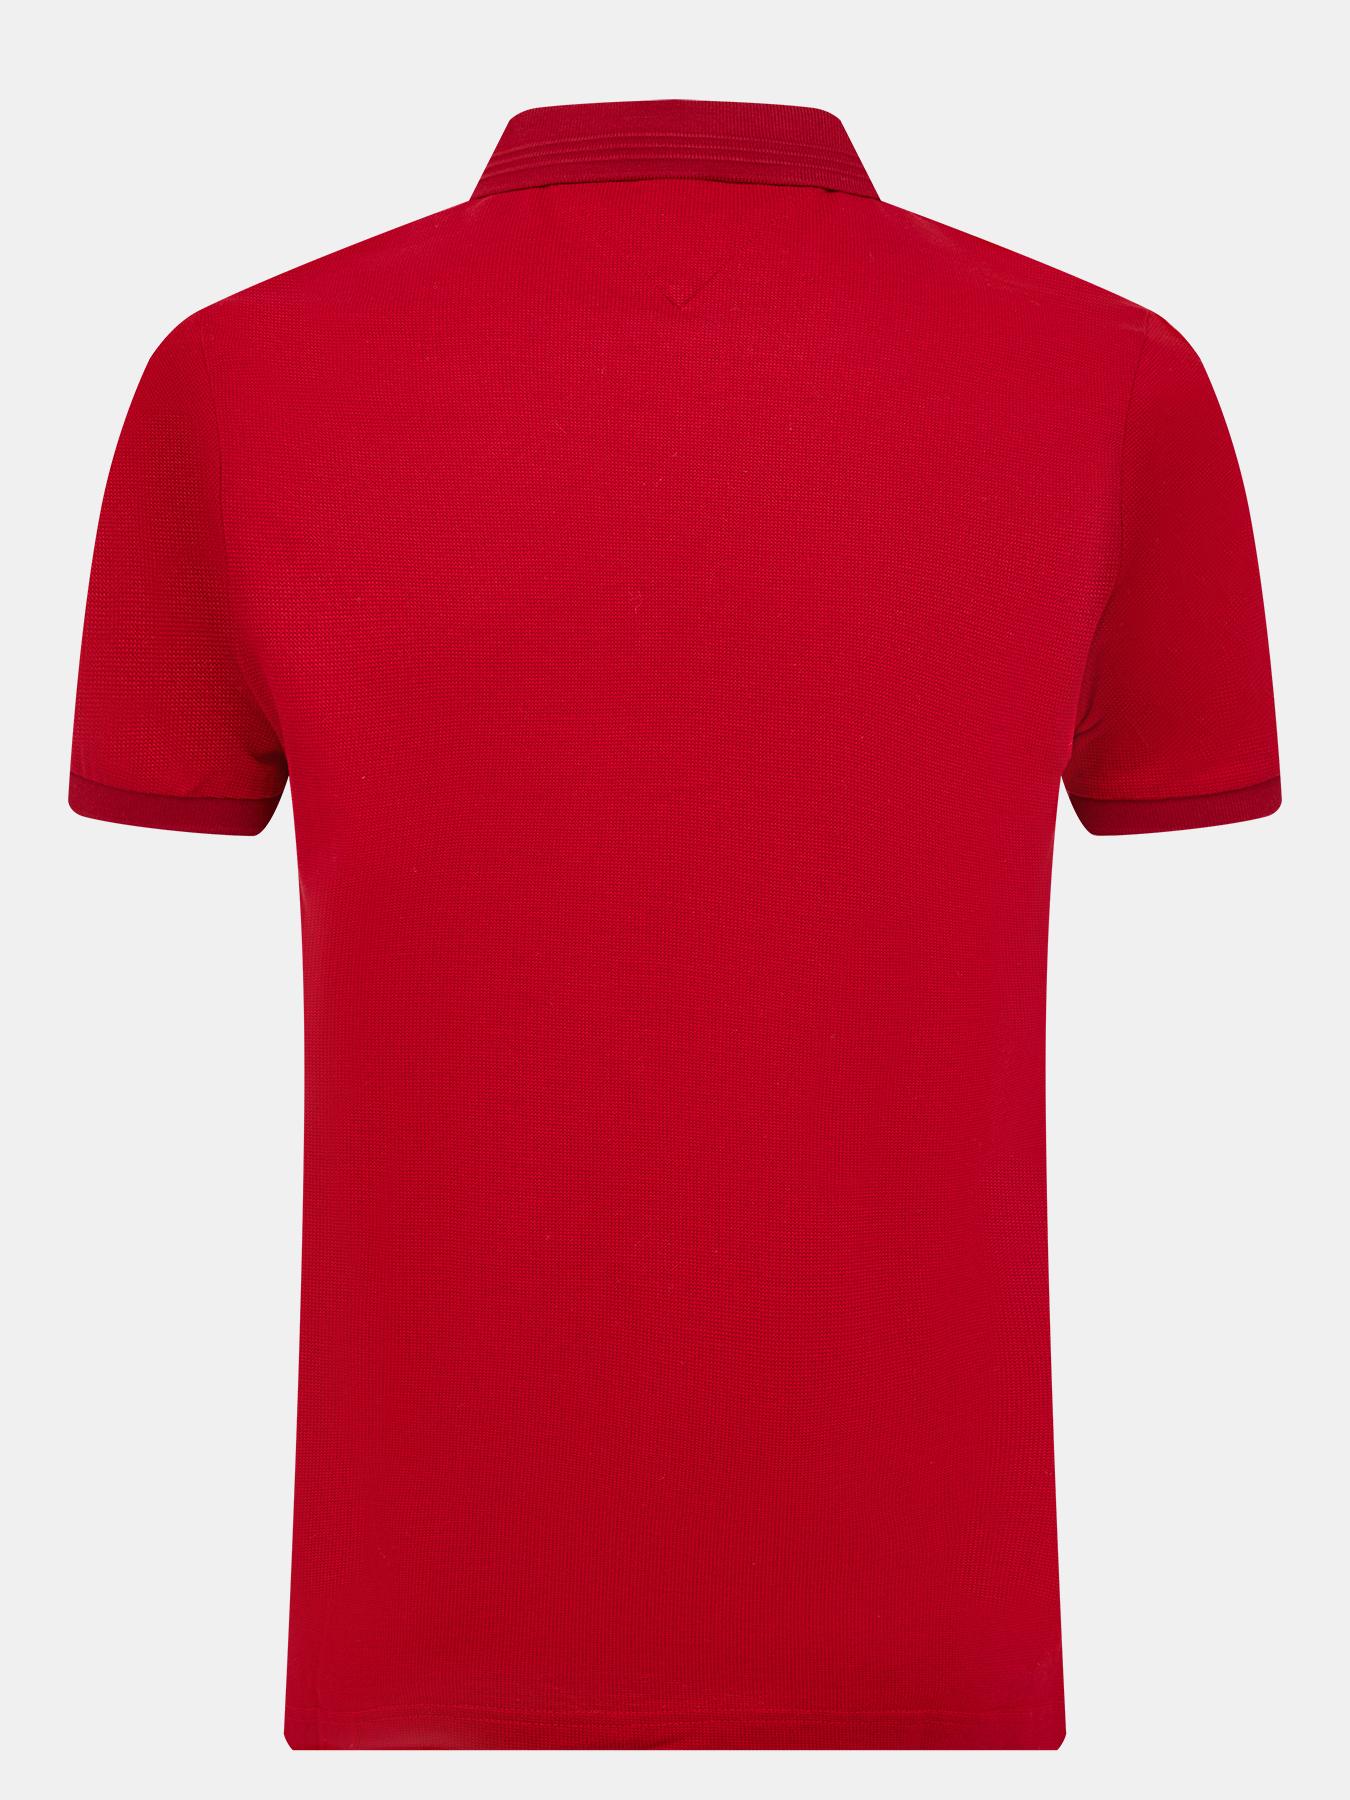 Рубашка с воротом поло Tommy Hilfiger Поло водолазка tommy hilfiger tommy hilfiger to263ewfjiw2